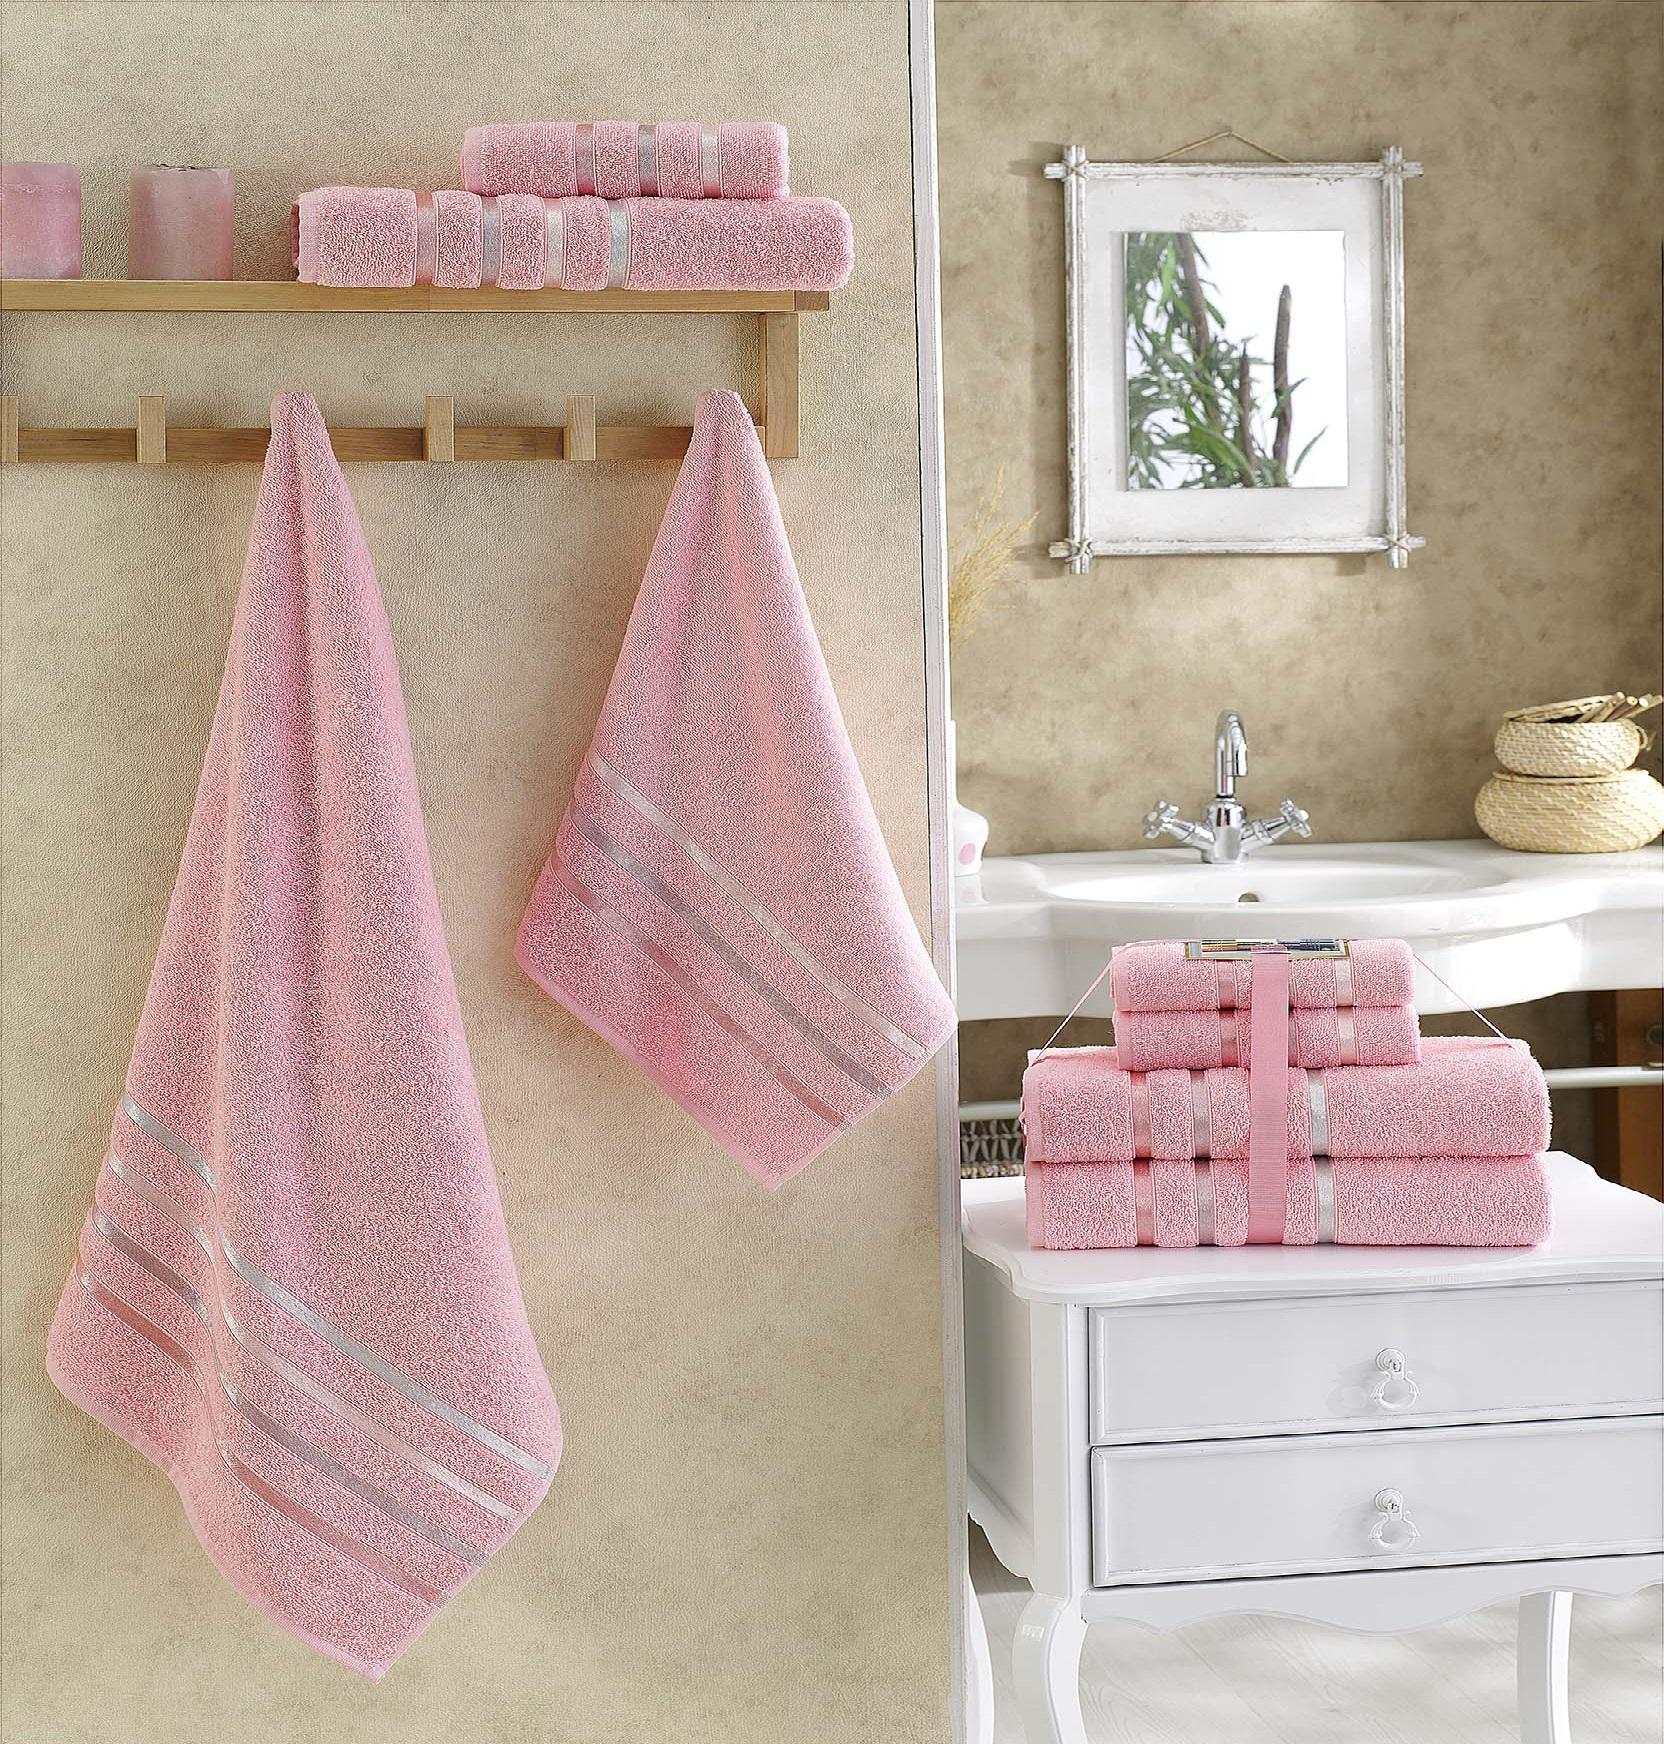 Полотенца Karna Полотенце Bale Цвет: Розовый (Набор) полотенца karna полотенце bale цвет розовый набор